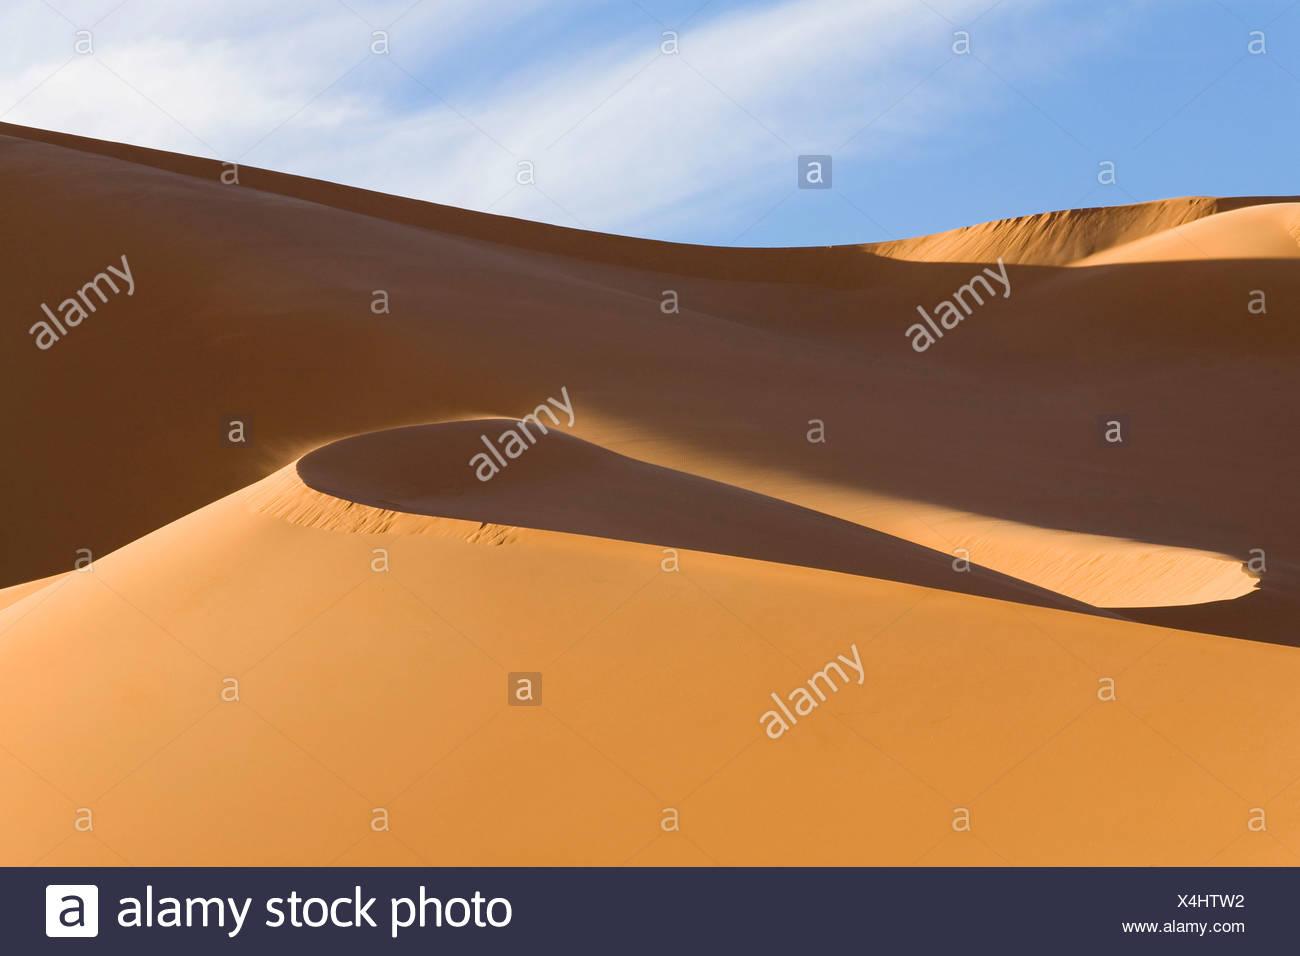 Le dune di sabbia del deserto libico, Erg Murzuq, Libia, Sahara, Africa Settentrionale, Africa Foto Stock